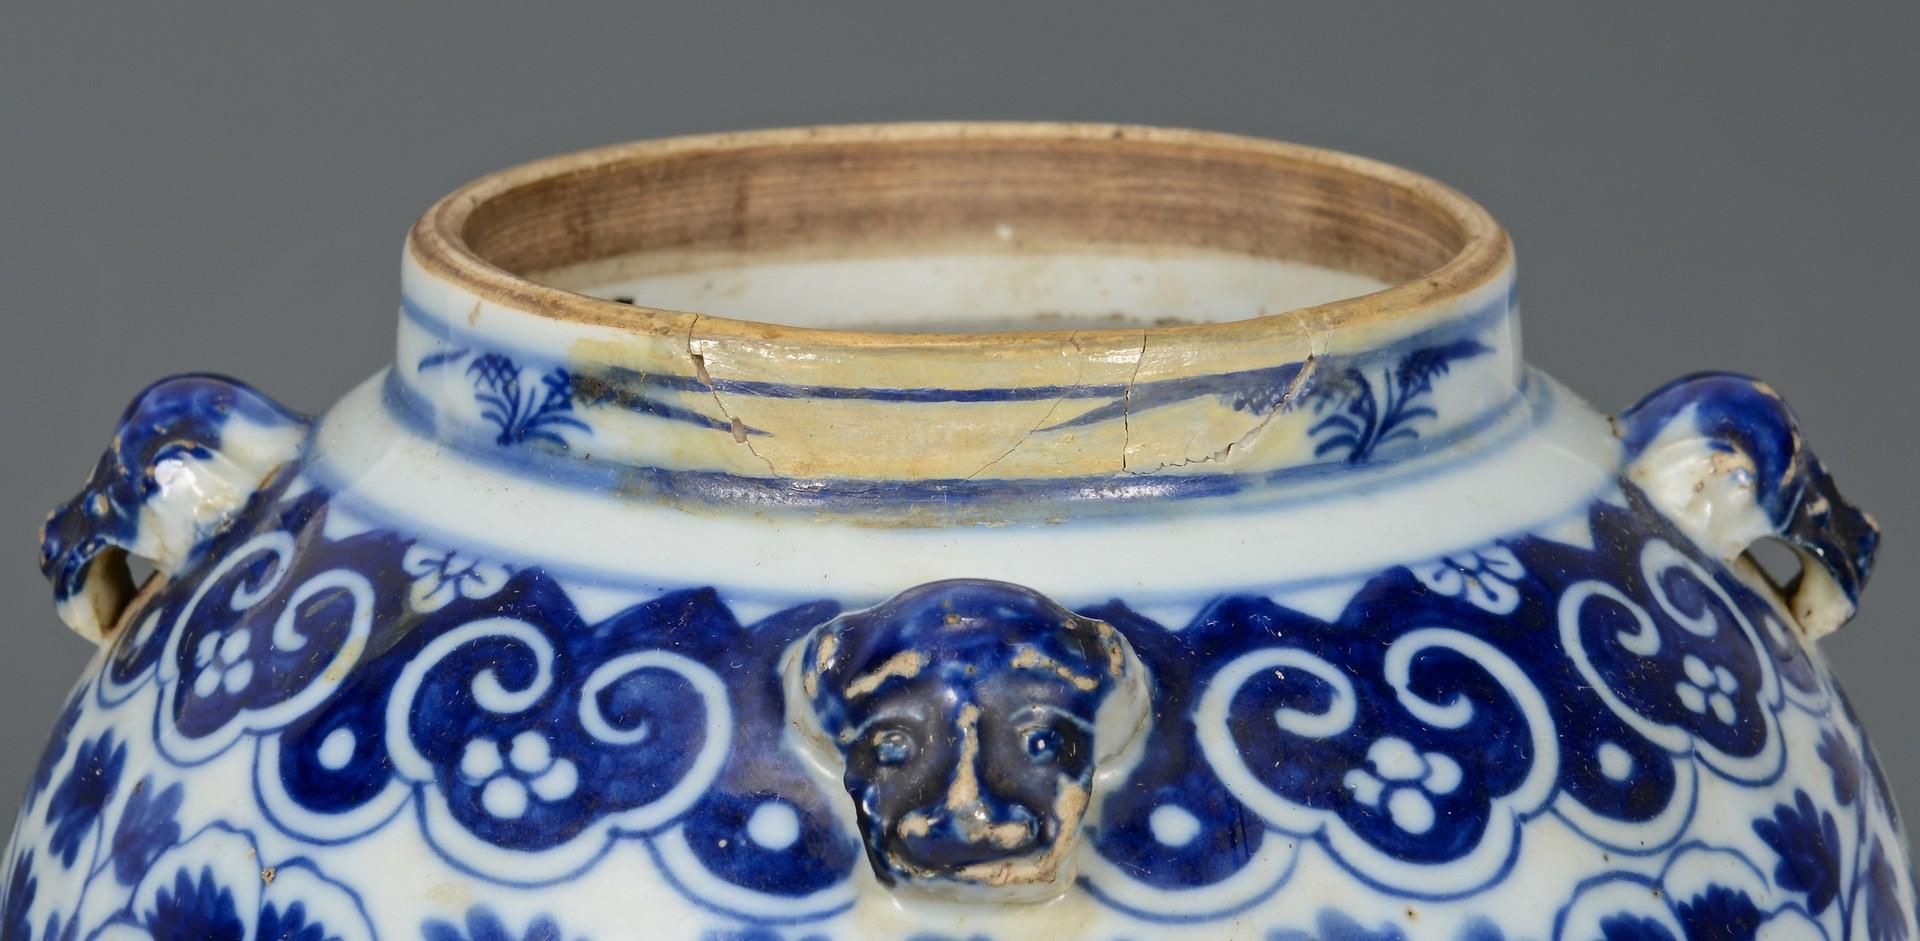 Lot 4010214: 2 Chinese Porcelain Vases